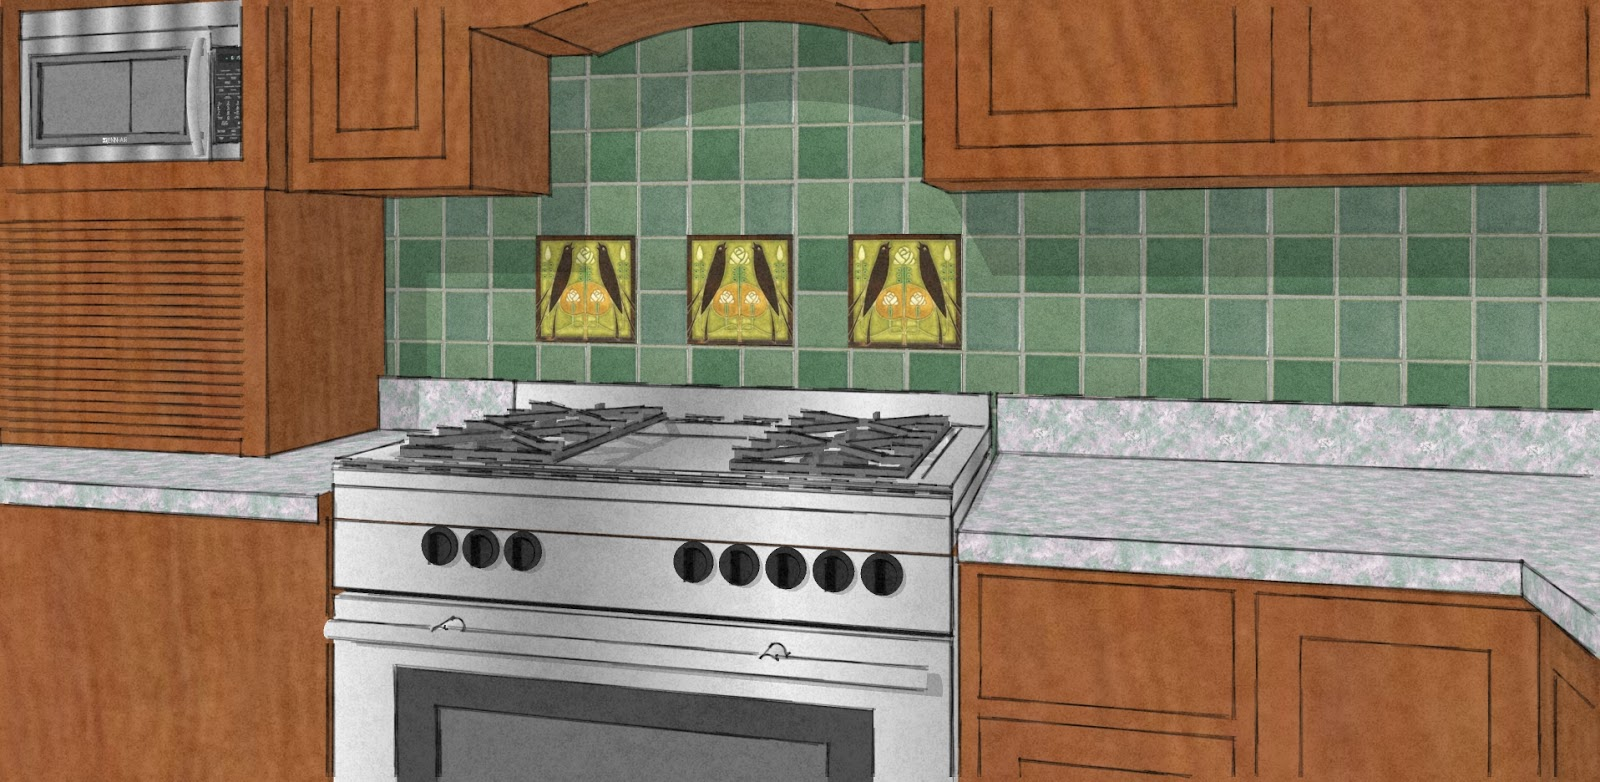 craftsman kitchen backsplash refacing thermofoil cabinets arts and crafts tiles for tile design ideas